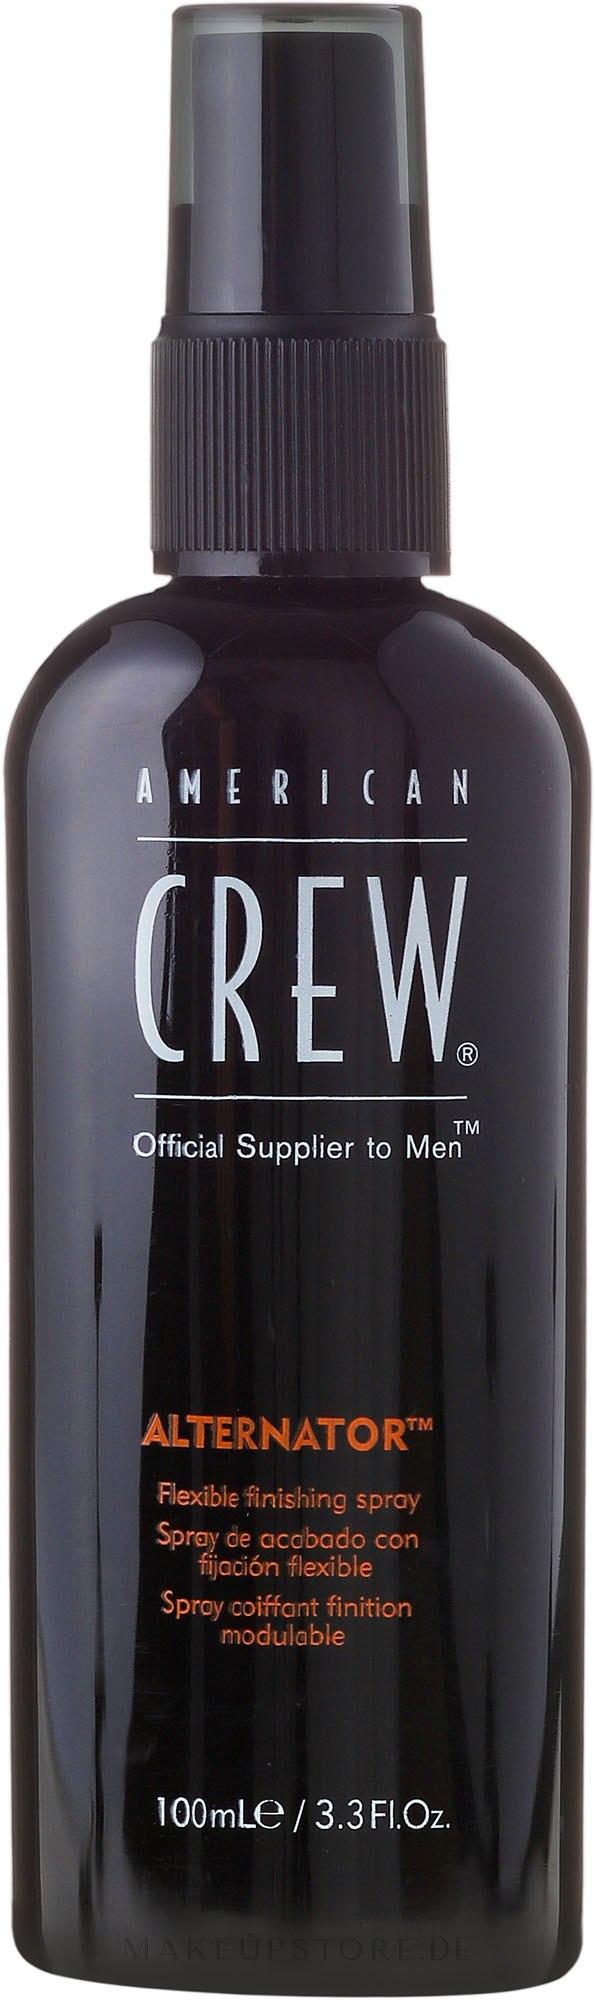 Stylingspray mit flexiblem Halt - American Crew Alternator — Bild 100 ml